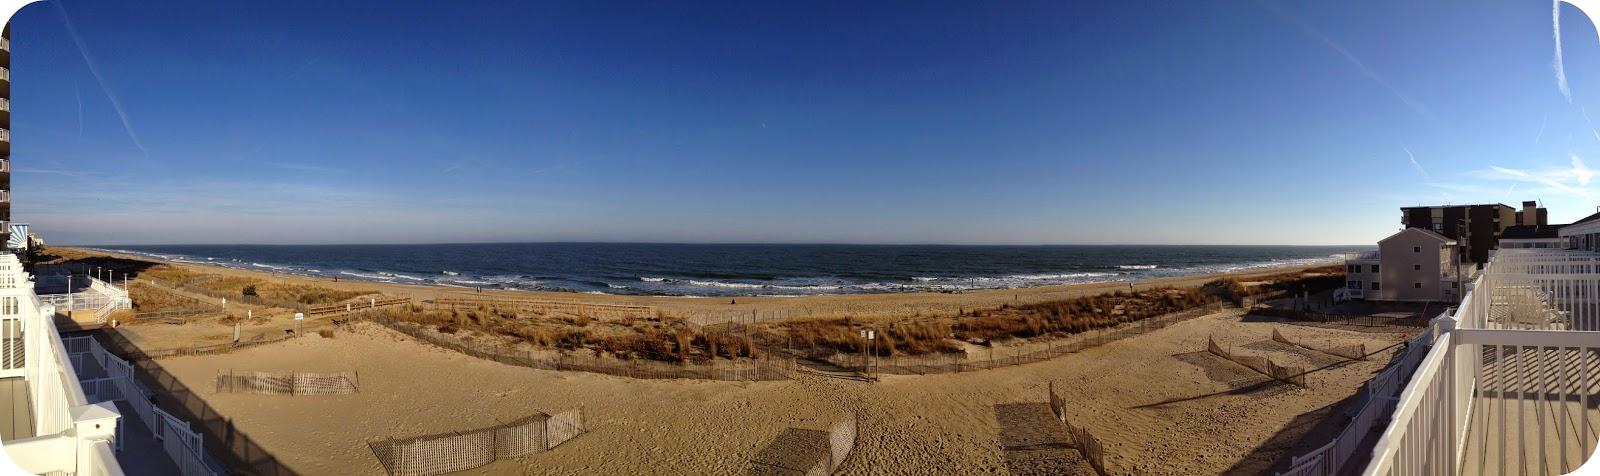 Very oceanfront at Ocean Colony 7 www.condoinoceancitymaryland.com